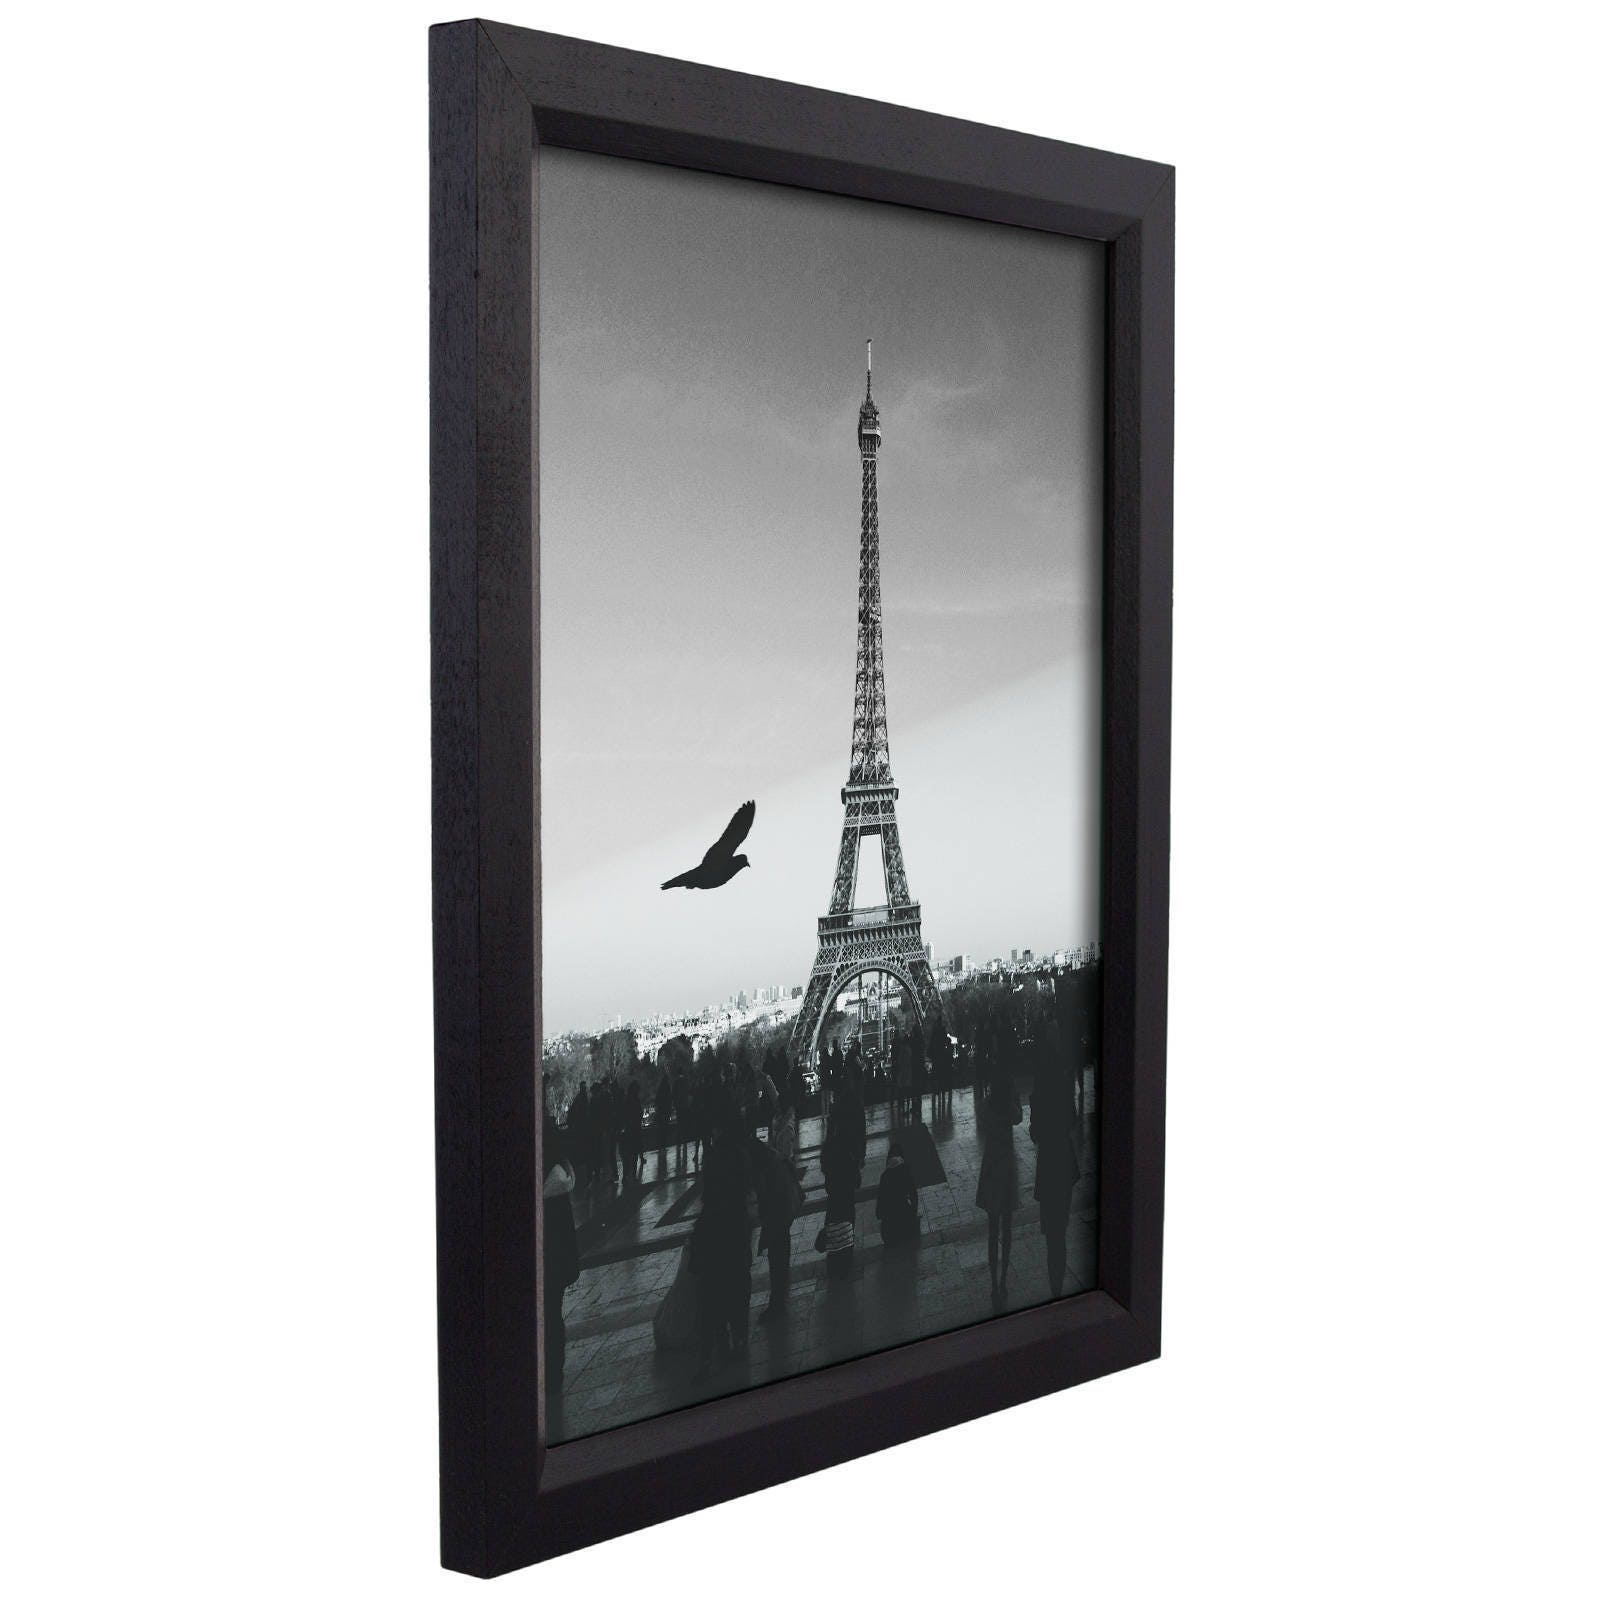 Poster frames 24x30